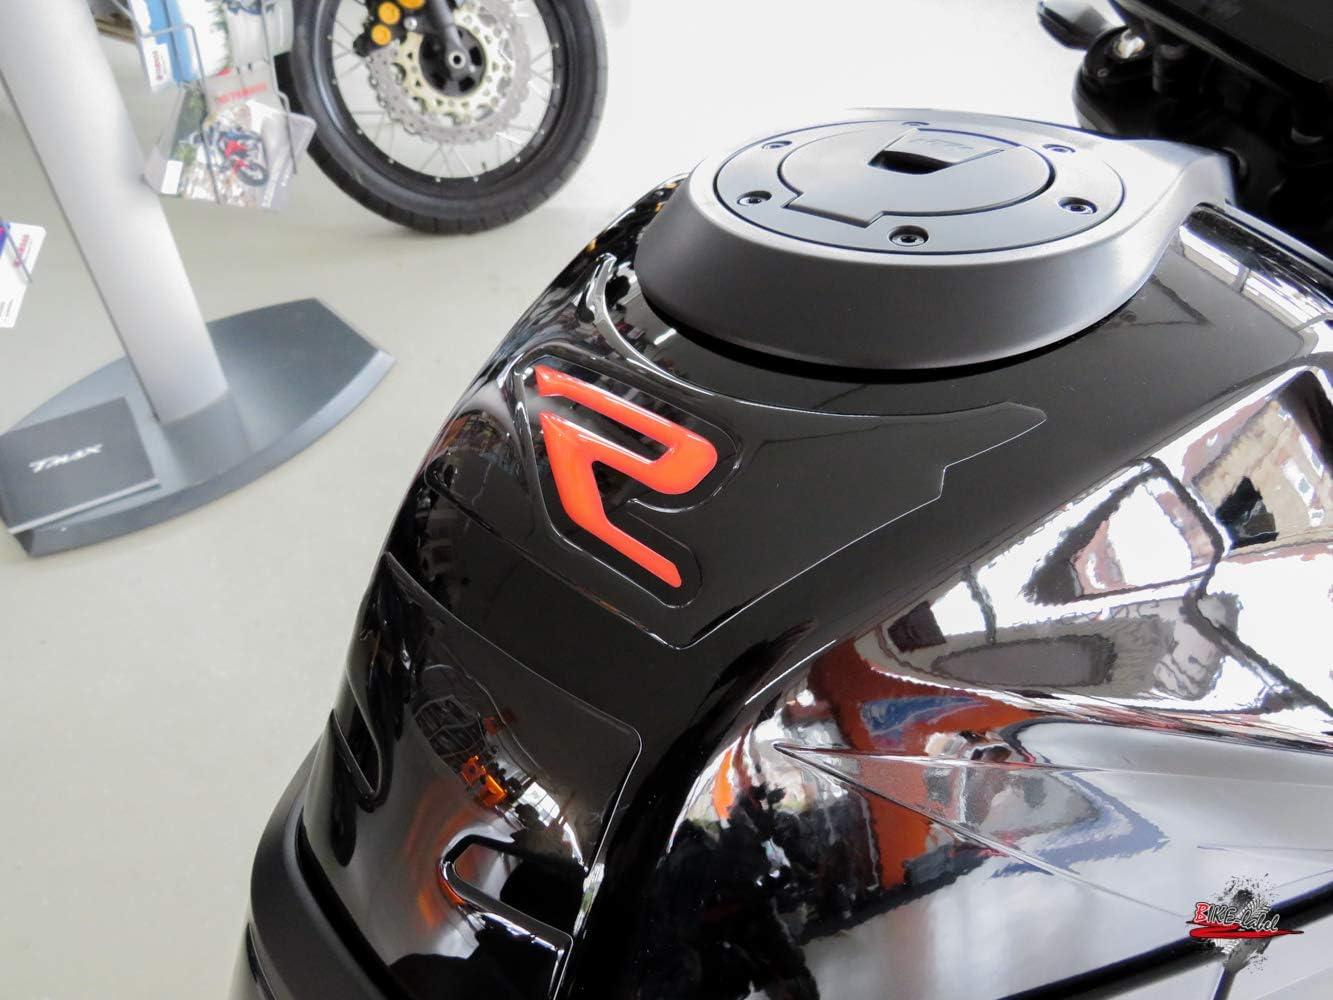 BIKE-label 502579-VA a partir de 2020 Protector de dep/ósito compatible con KTM 1290 Super Duke R